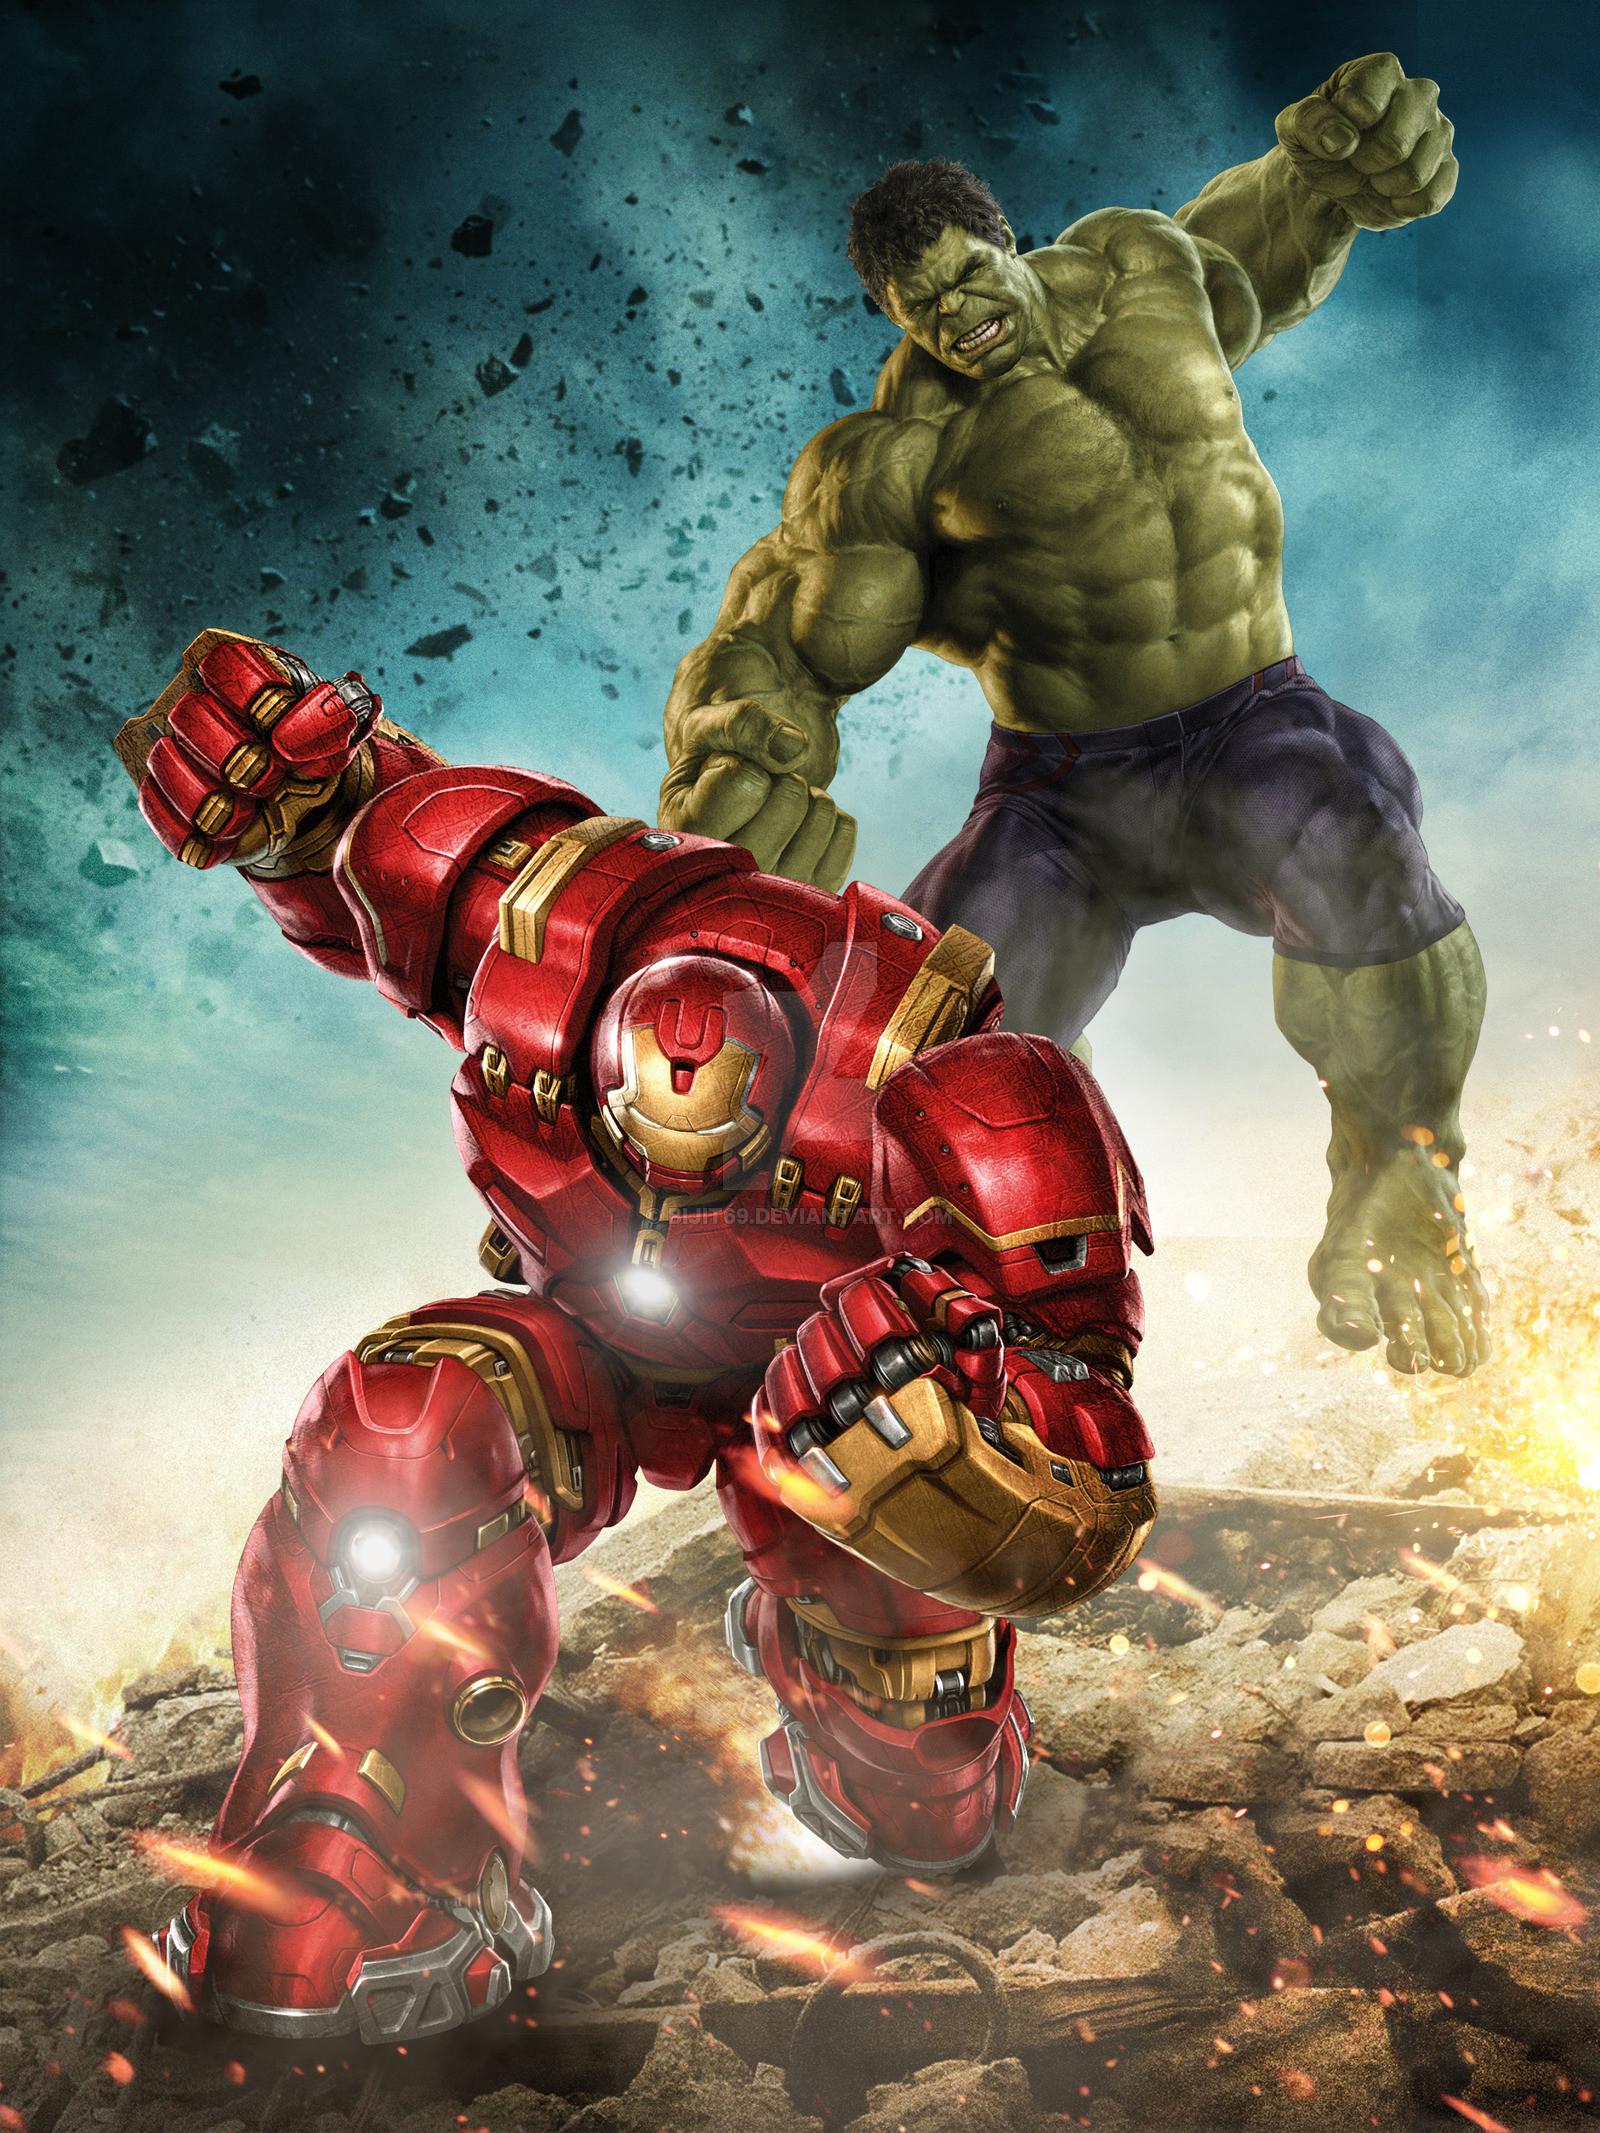 hulk vs hulkbuster by bijit69 watch fan art wallpaper movies tv 2015 .